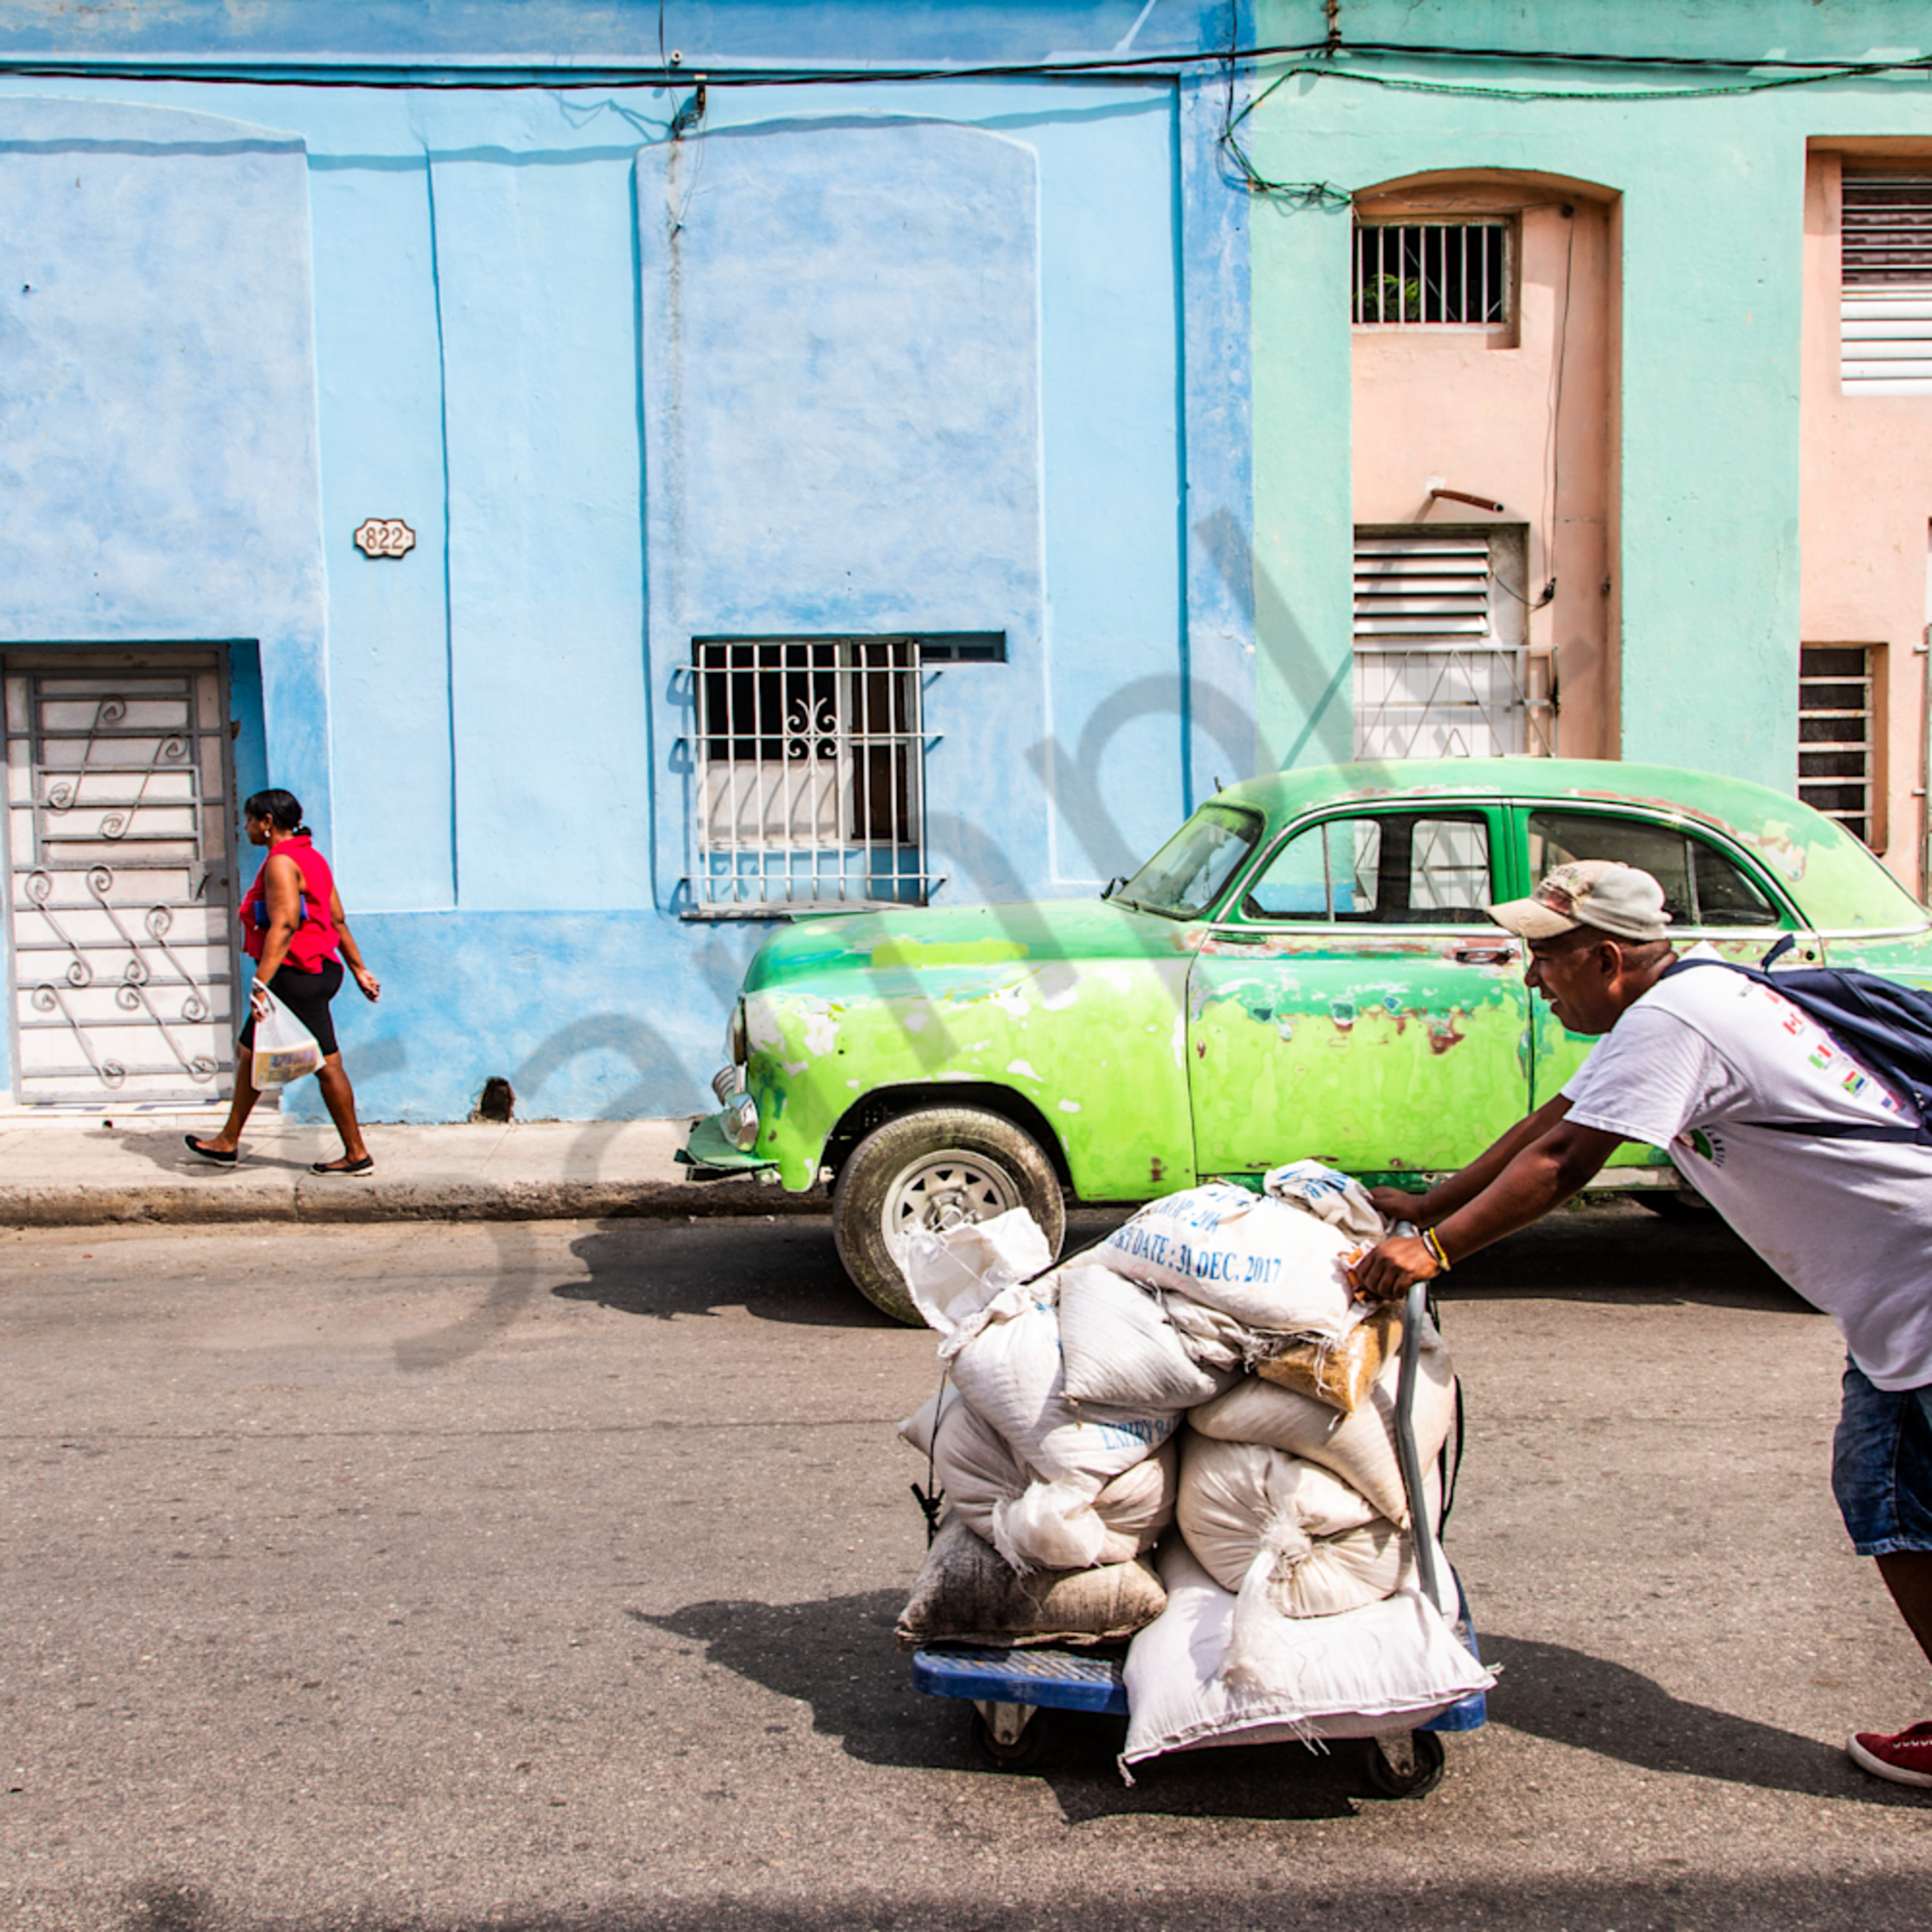 Cuba 6973 coatbj